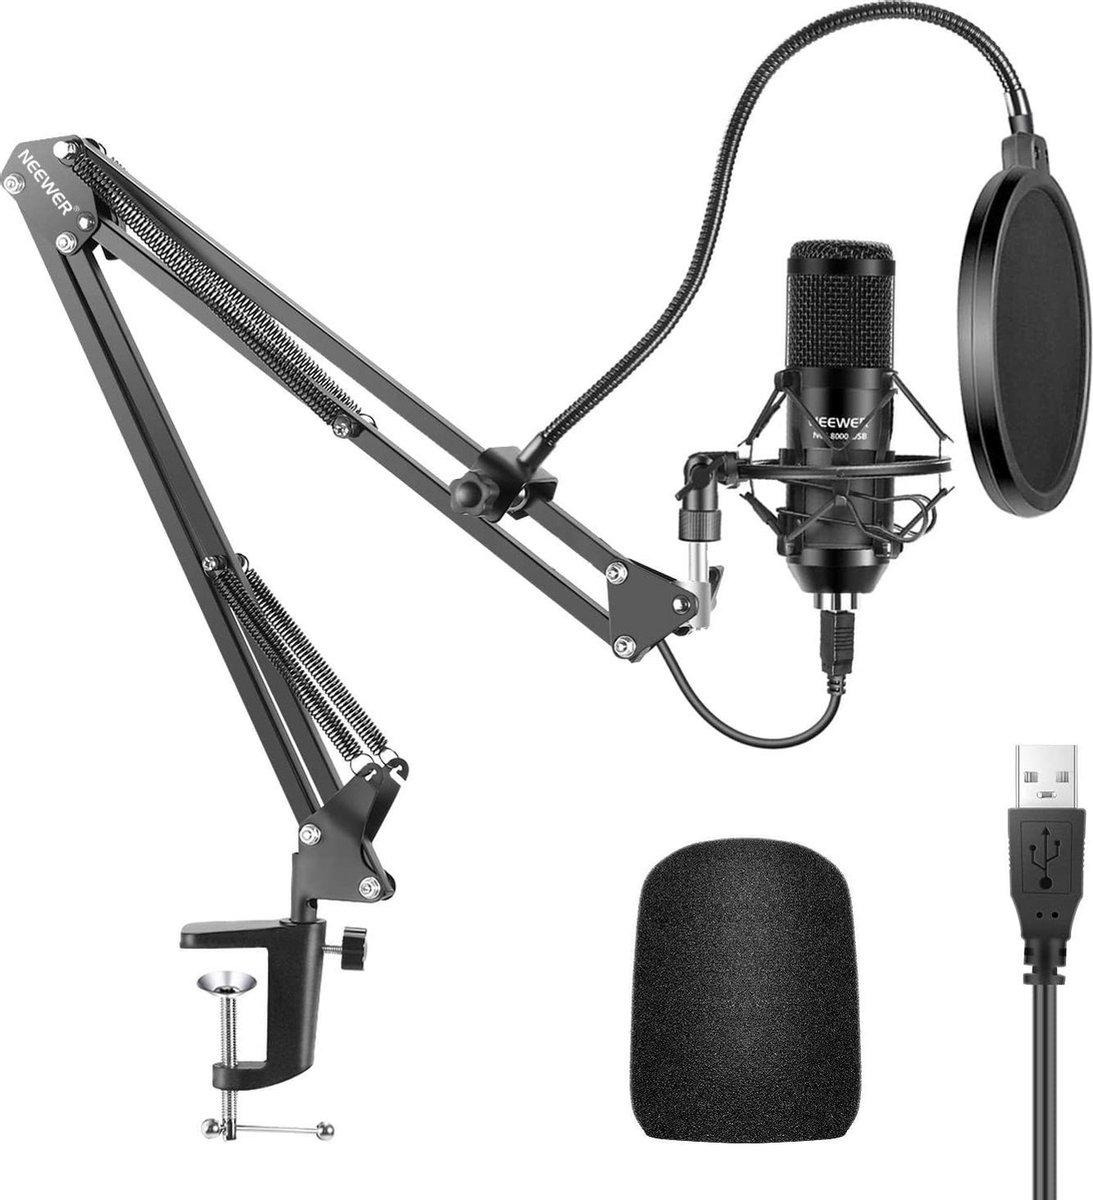 Neewer NW-8000 USB Microfoon | Studio microfoon | Microfoon Arm | Streaming | Podcast | Gaming | PC | Plug & Play | Zwart